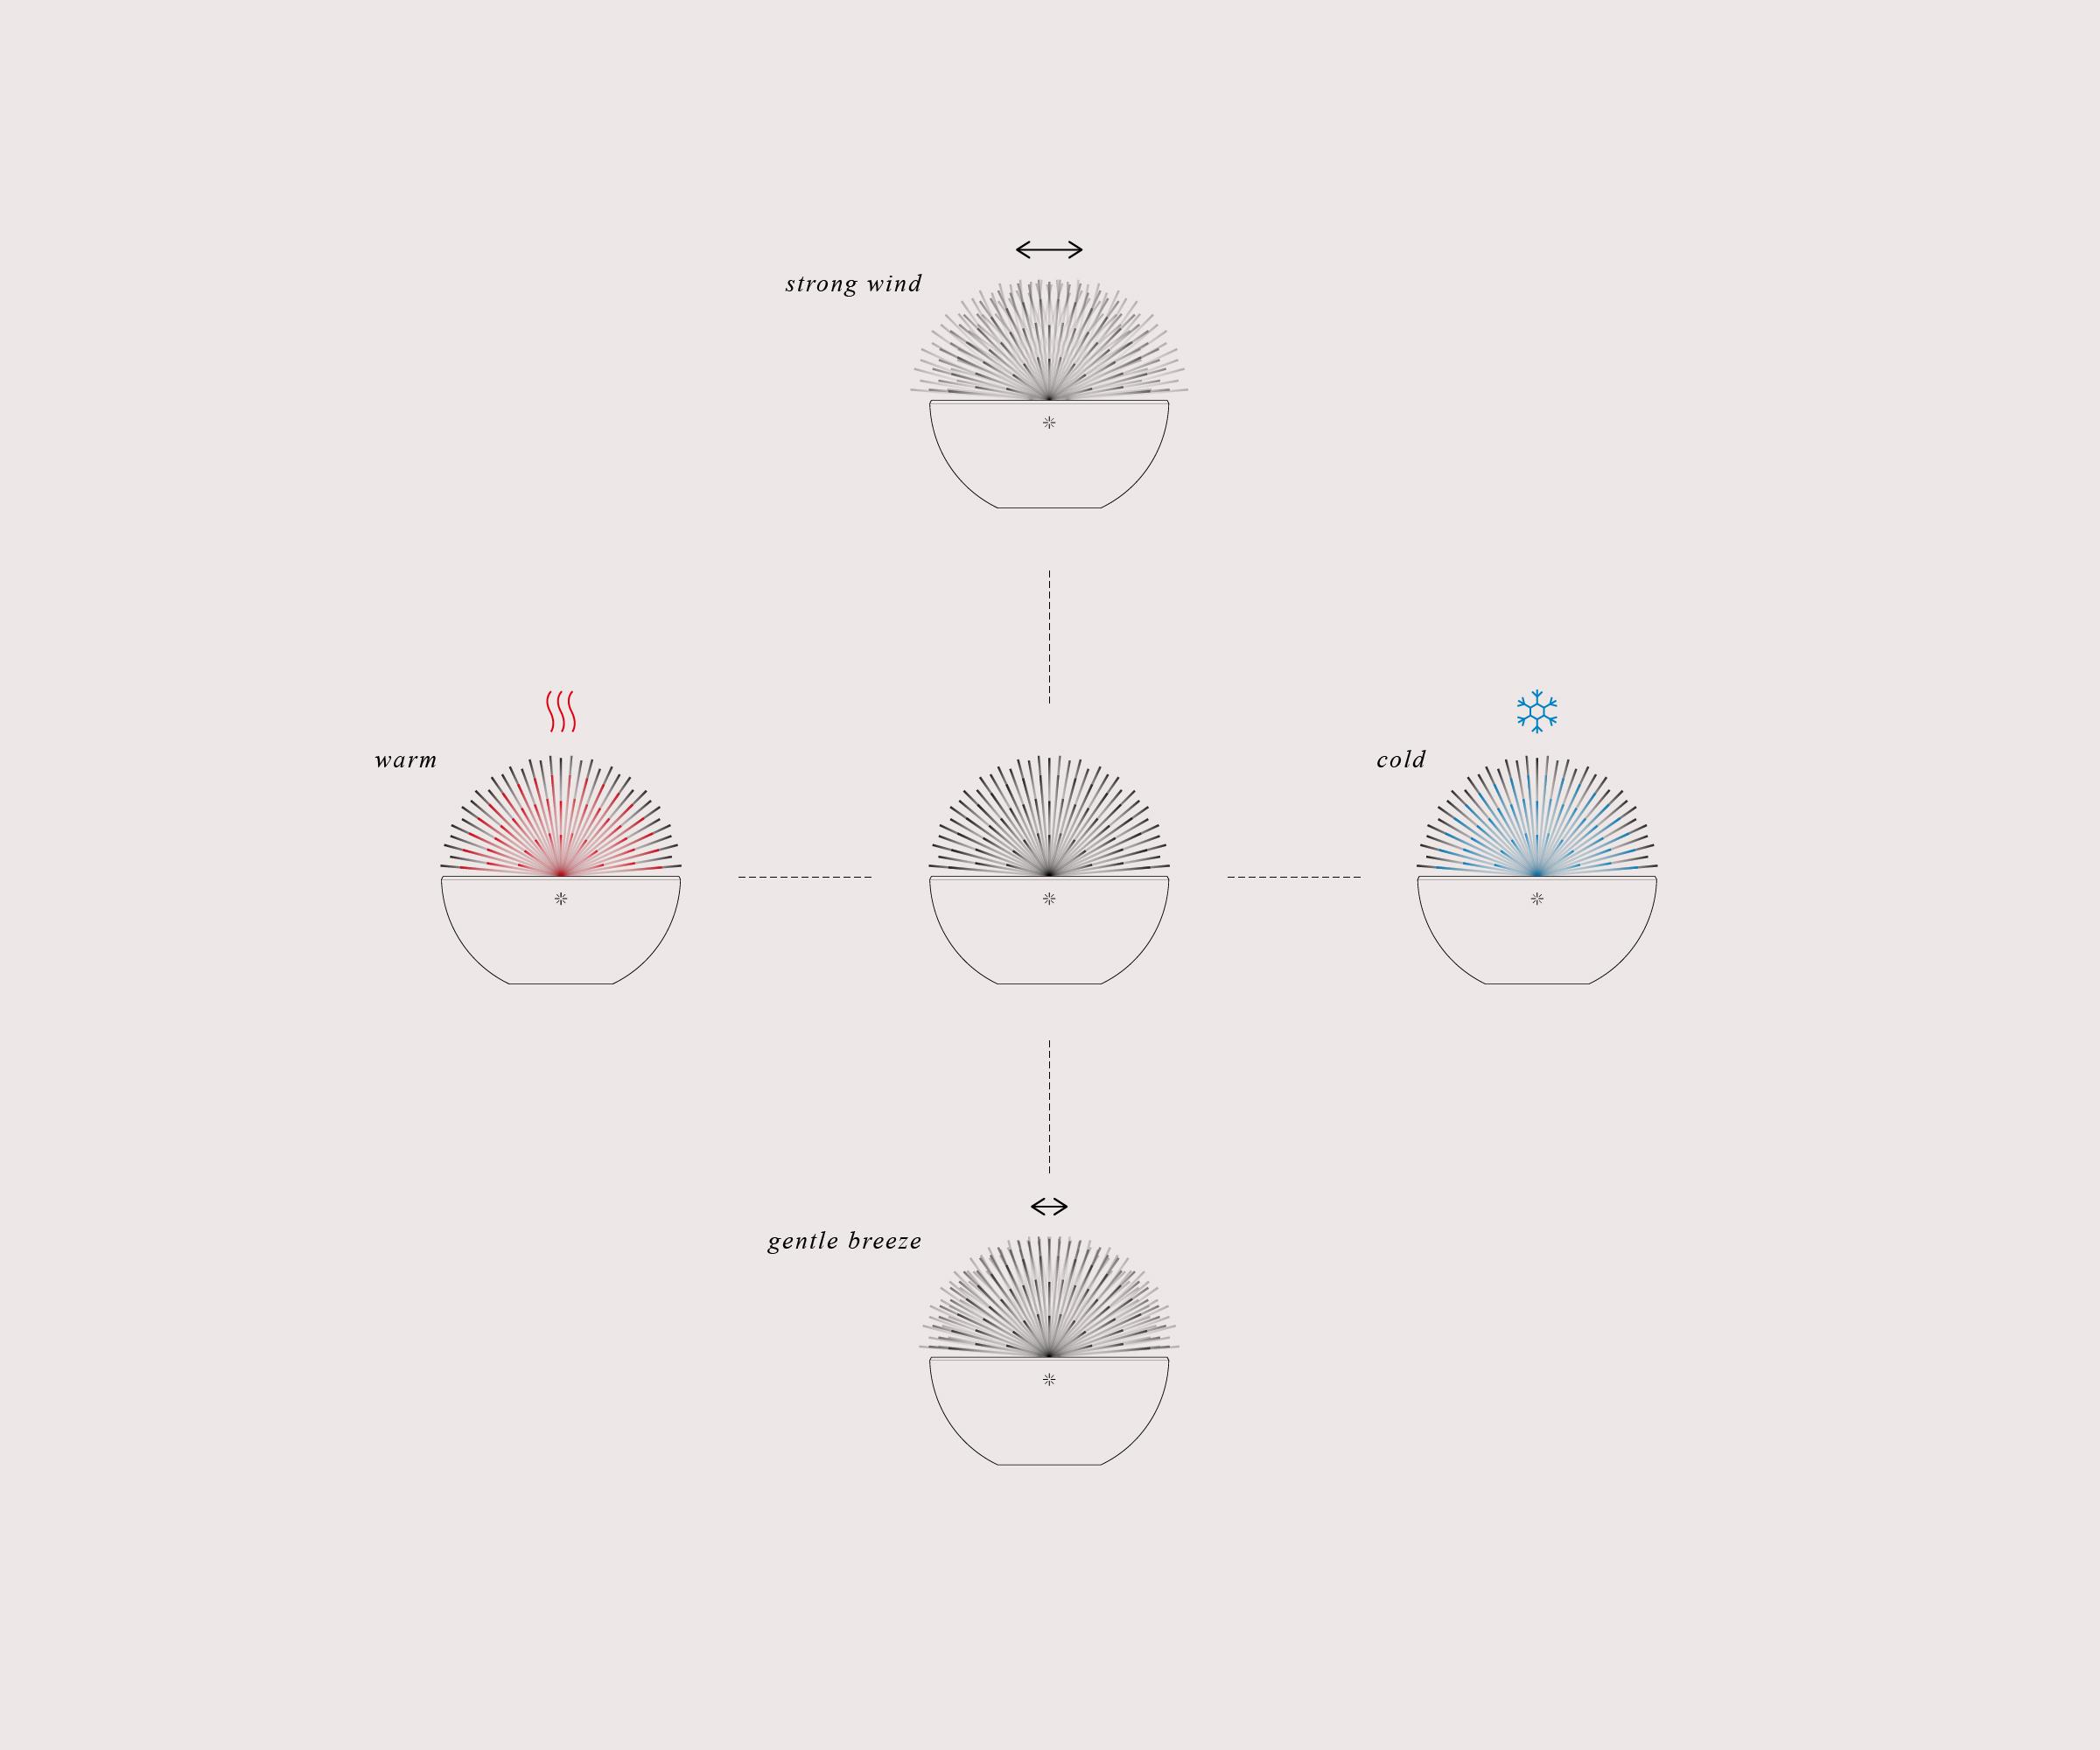 dandelion-illust-scenario.jpg